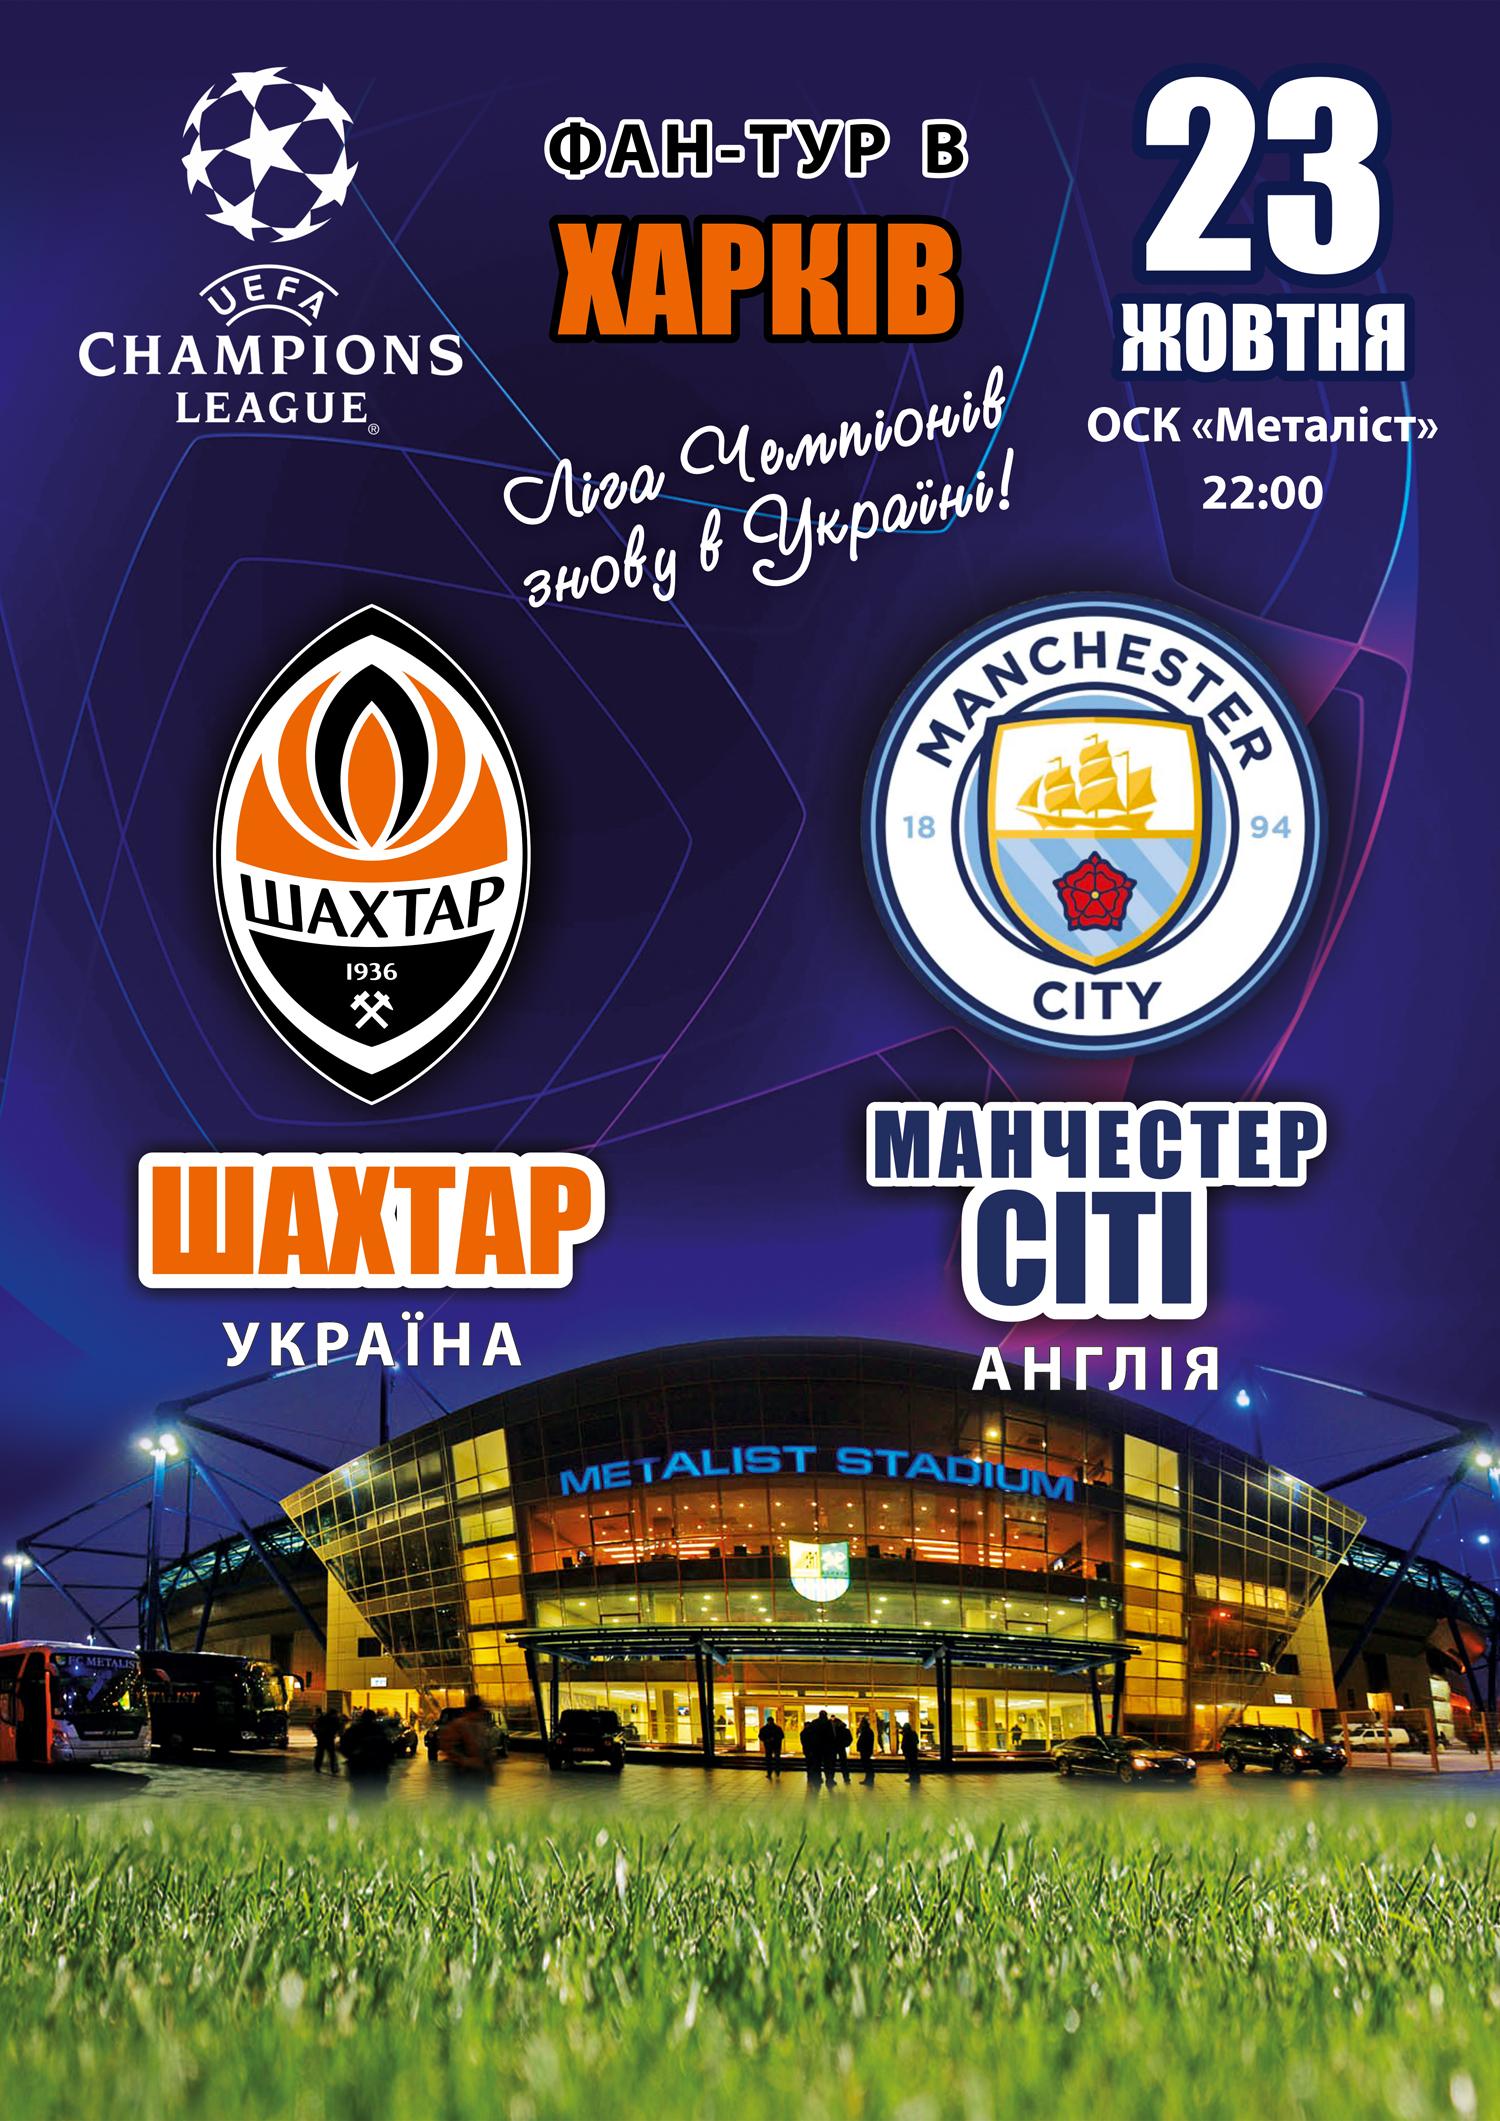 Фан-тур на матч Лиги Чемпионов Шахтер–Манчестер Сити (Запорожье)